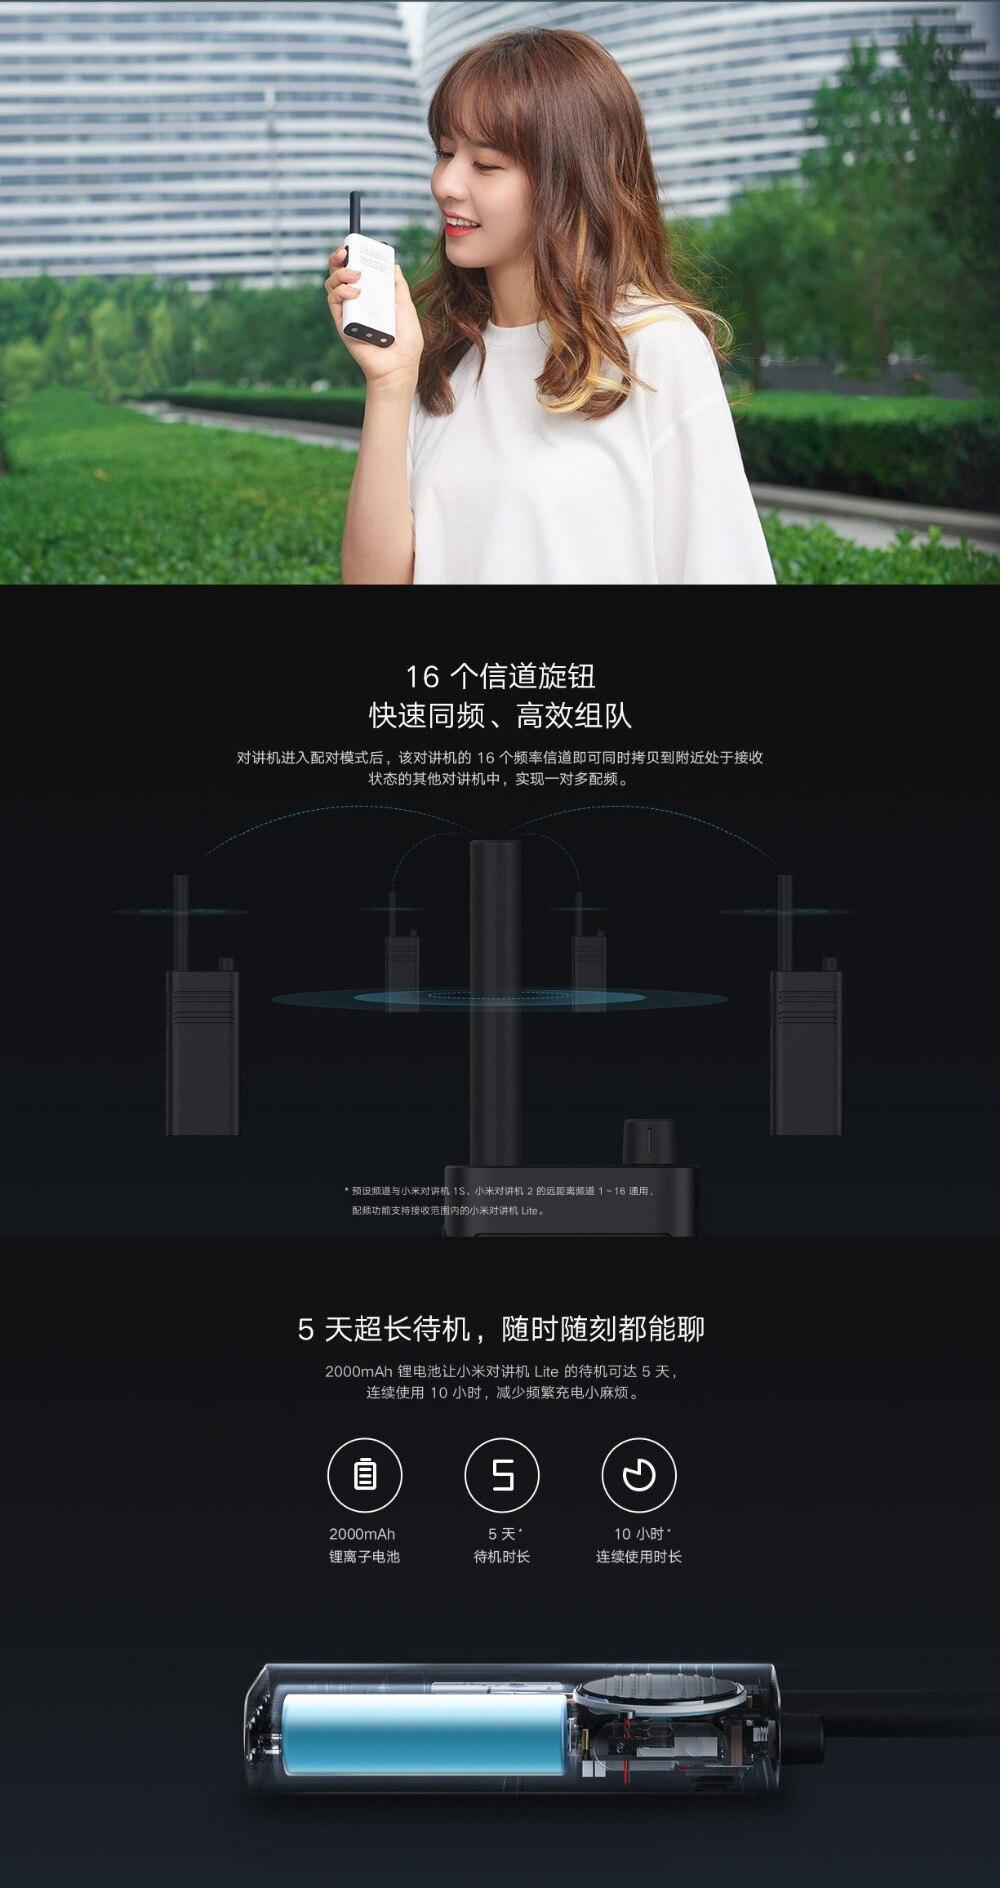 2020 New Xiaomi Mijia Walkie Talkie Lite Civil 5 Km Intercom Outdoor Handheld Mini Radio Talkie Walkie Work with mi home app (4)